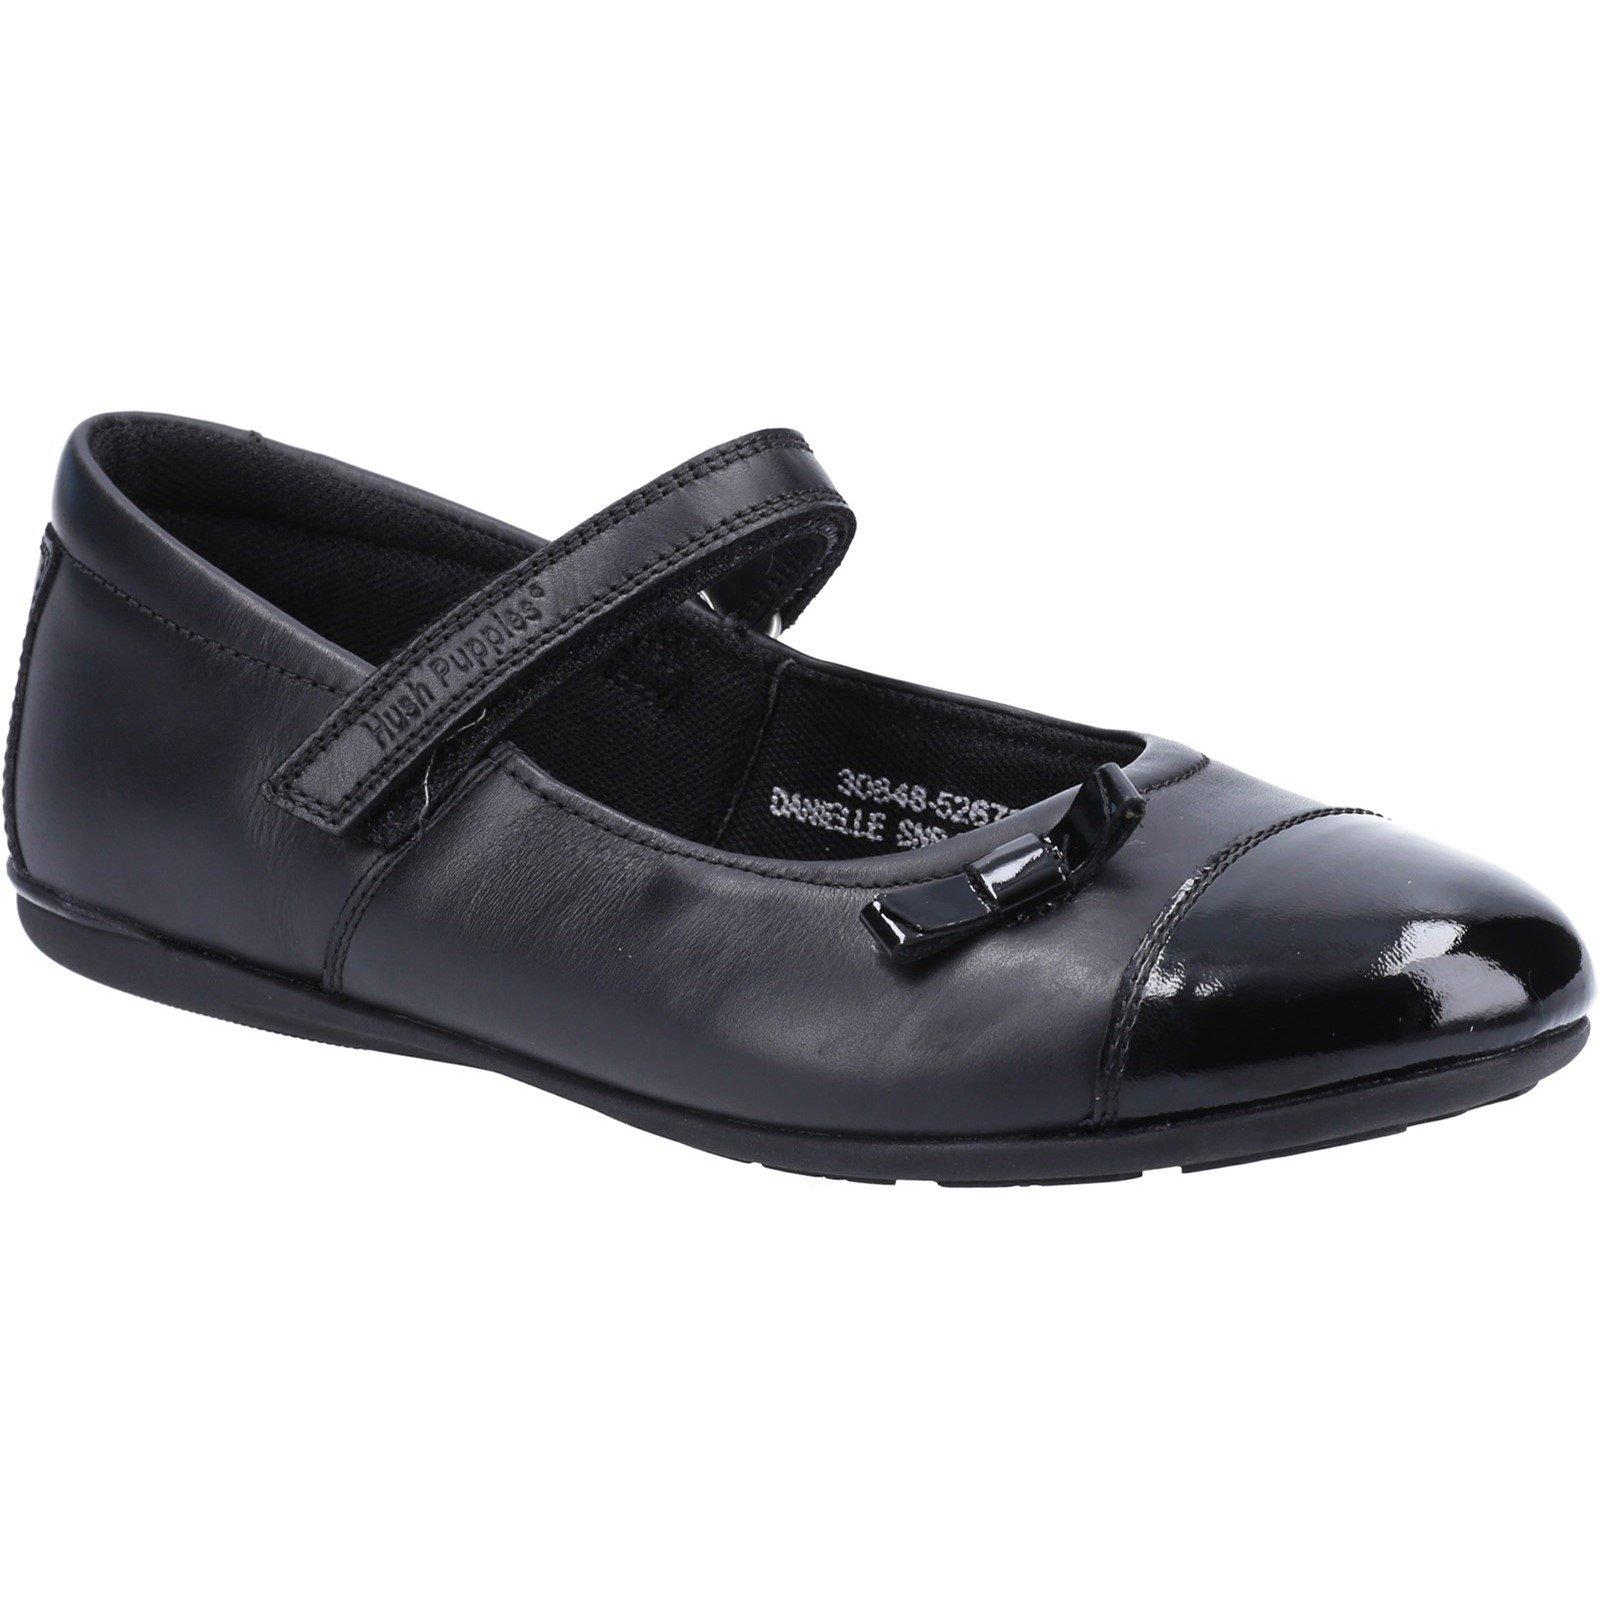 Hush Puppies Kid's Danielle Senior School Shoe Black 30848 - Black 5